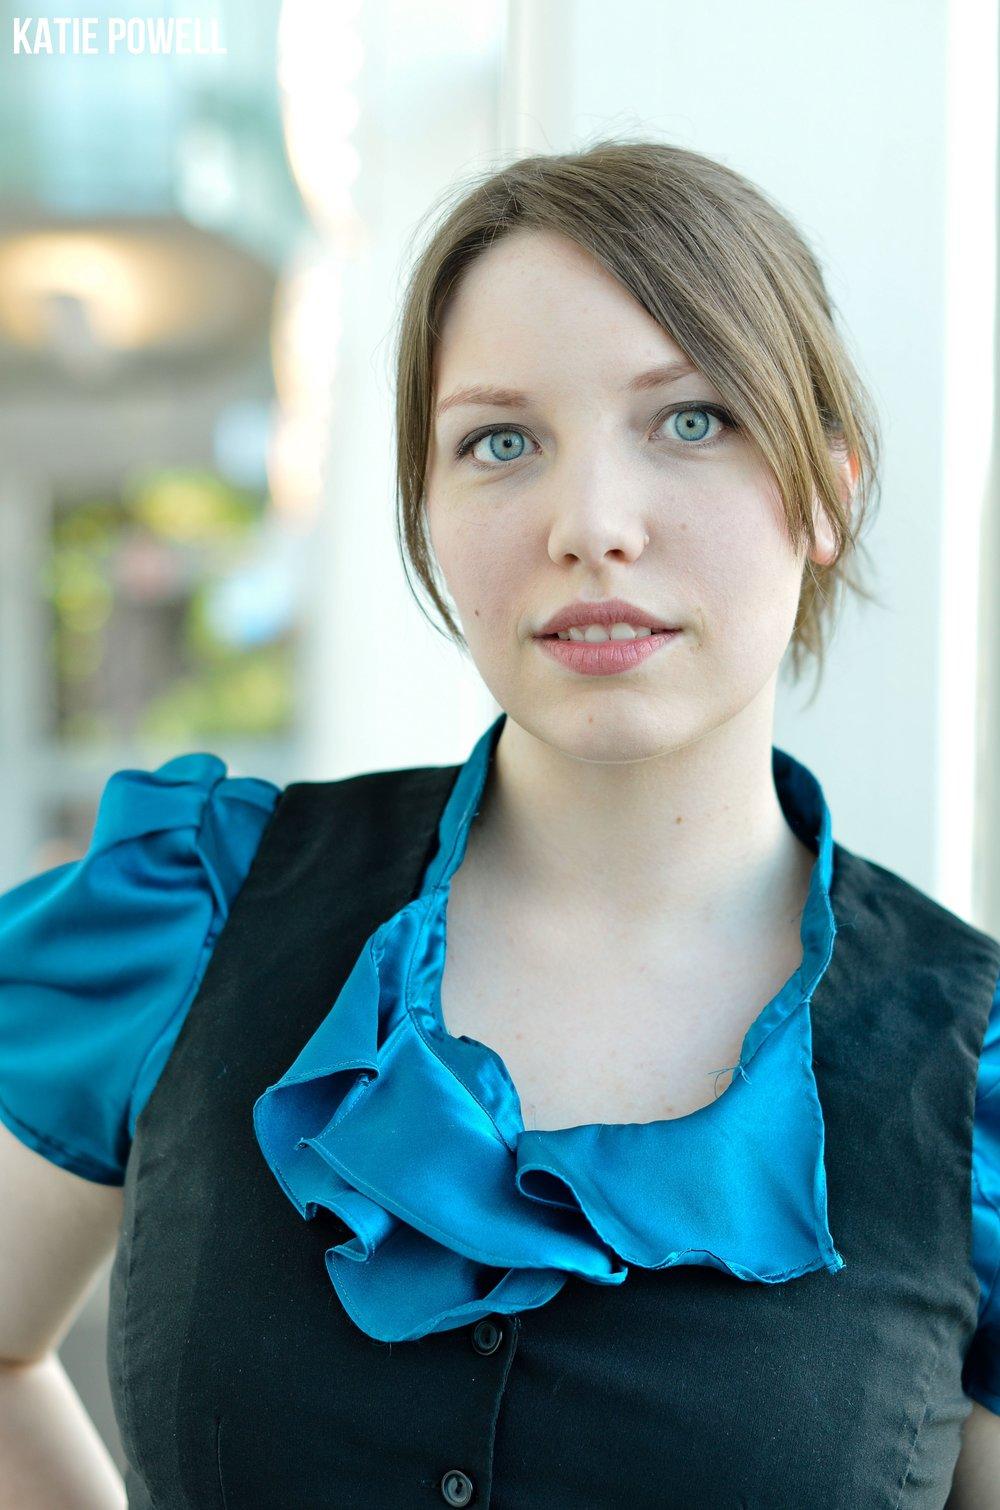 Erin Headshots Katie Powell Photography Vancouver White Rock-1.jpg